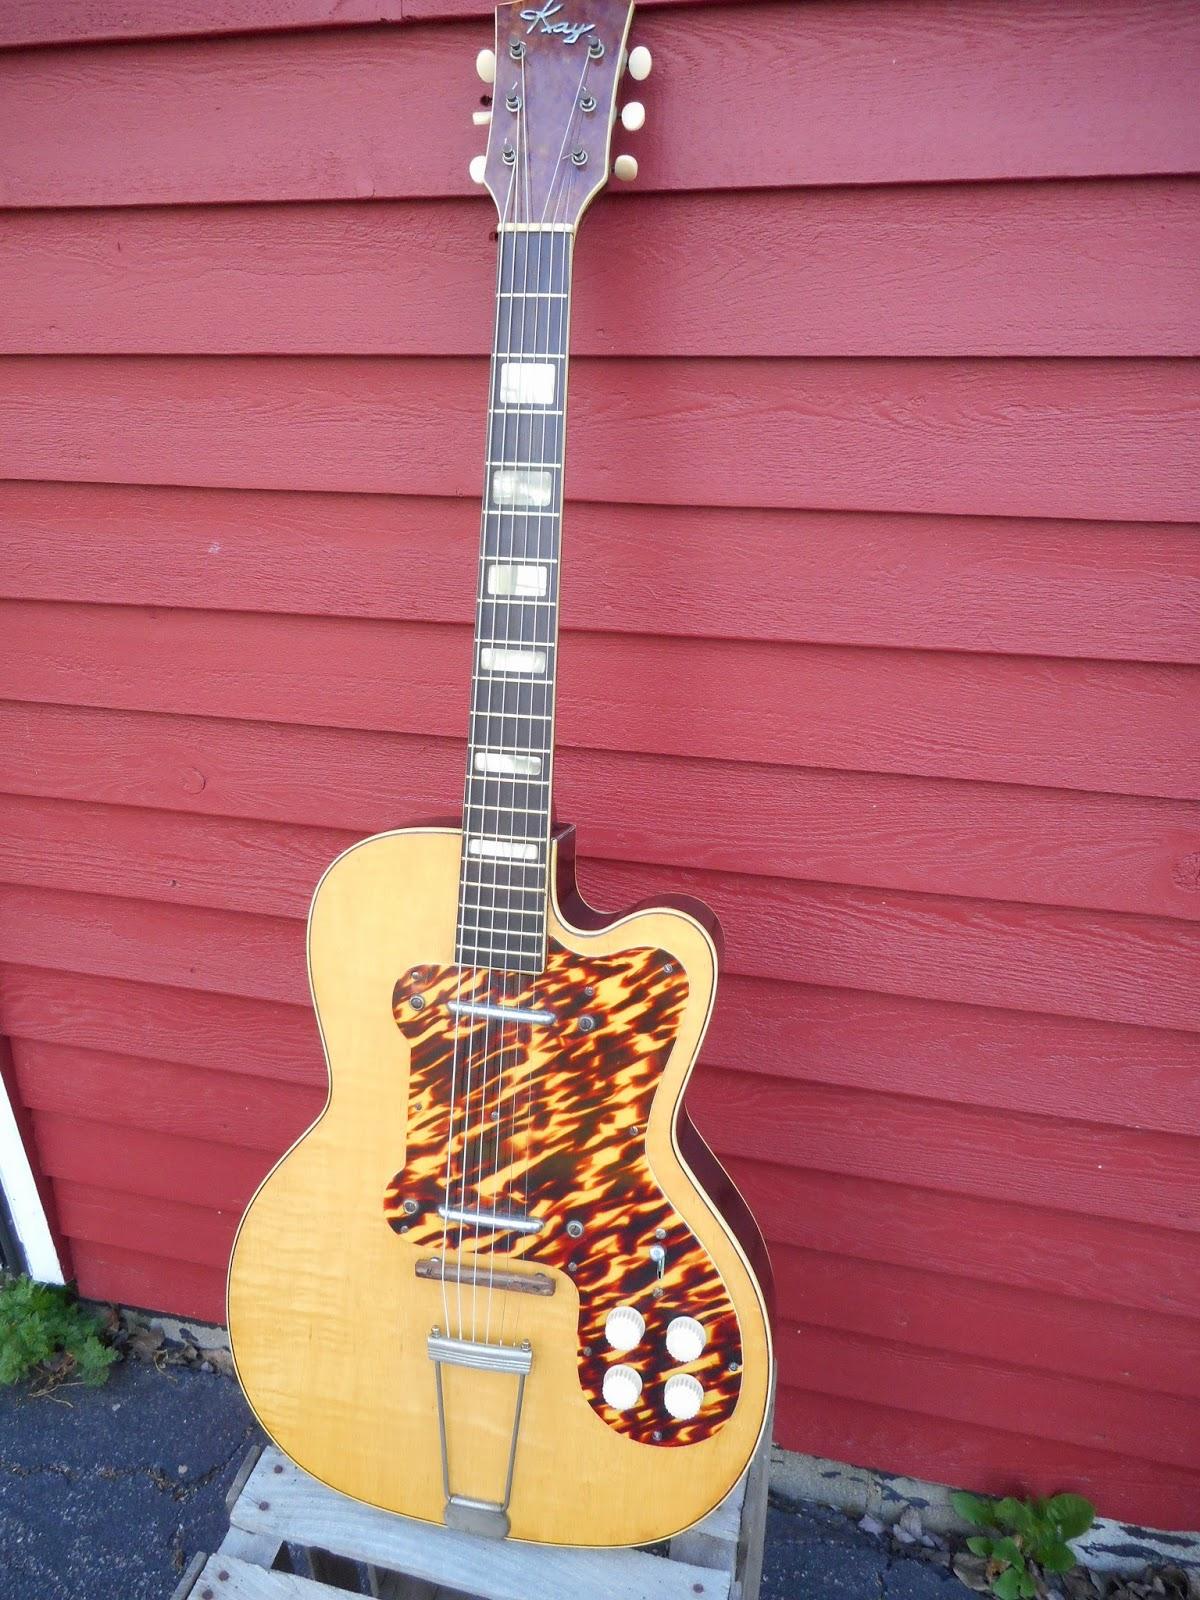 1950's Kay K161 Thin Twin Electric Guitar - AKA - Jimmy Reed